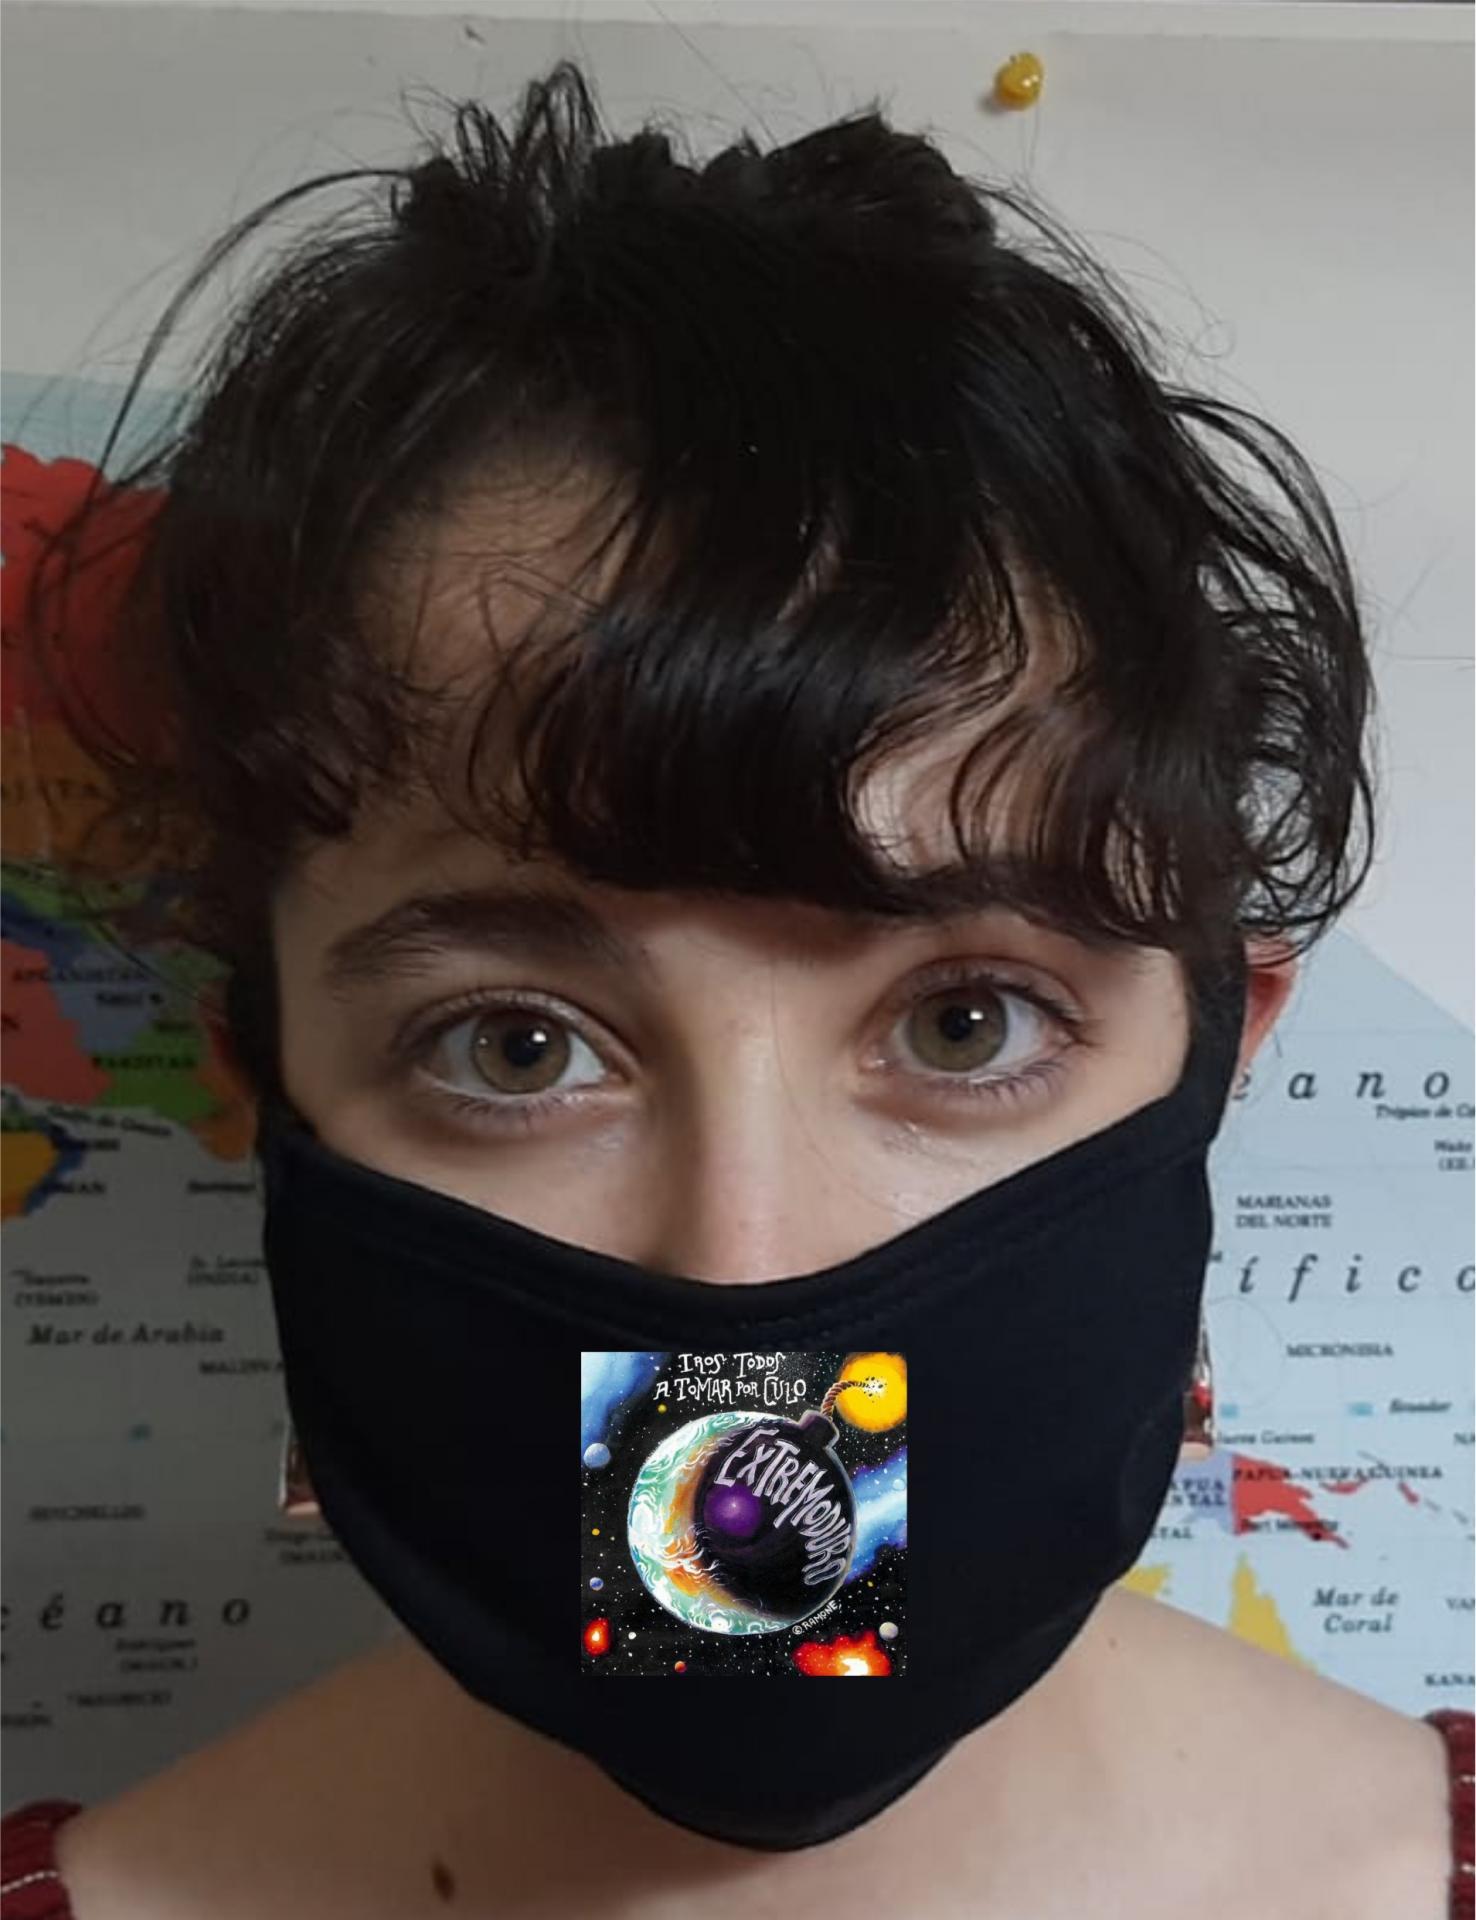 Mascarilla Protección Extremoduro Iros todos a tomar por culo